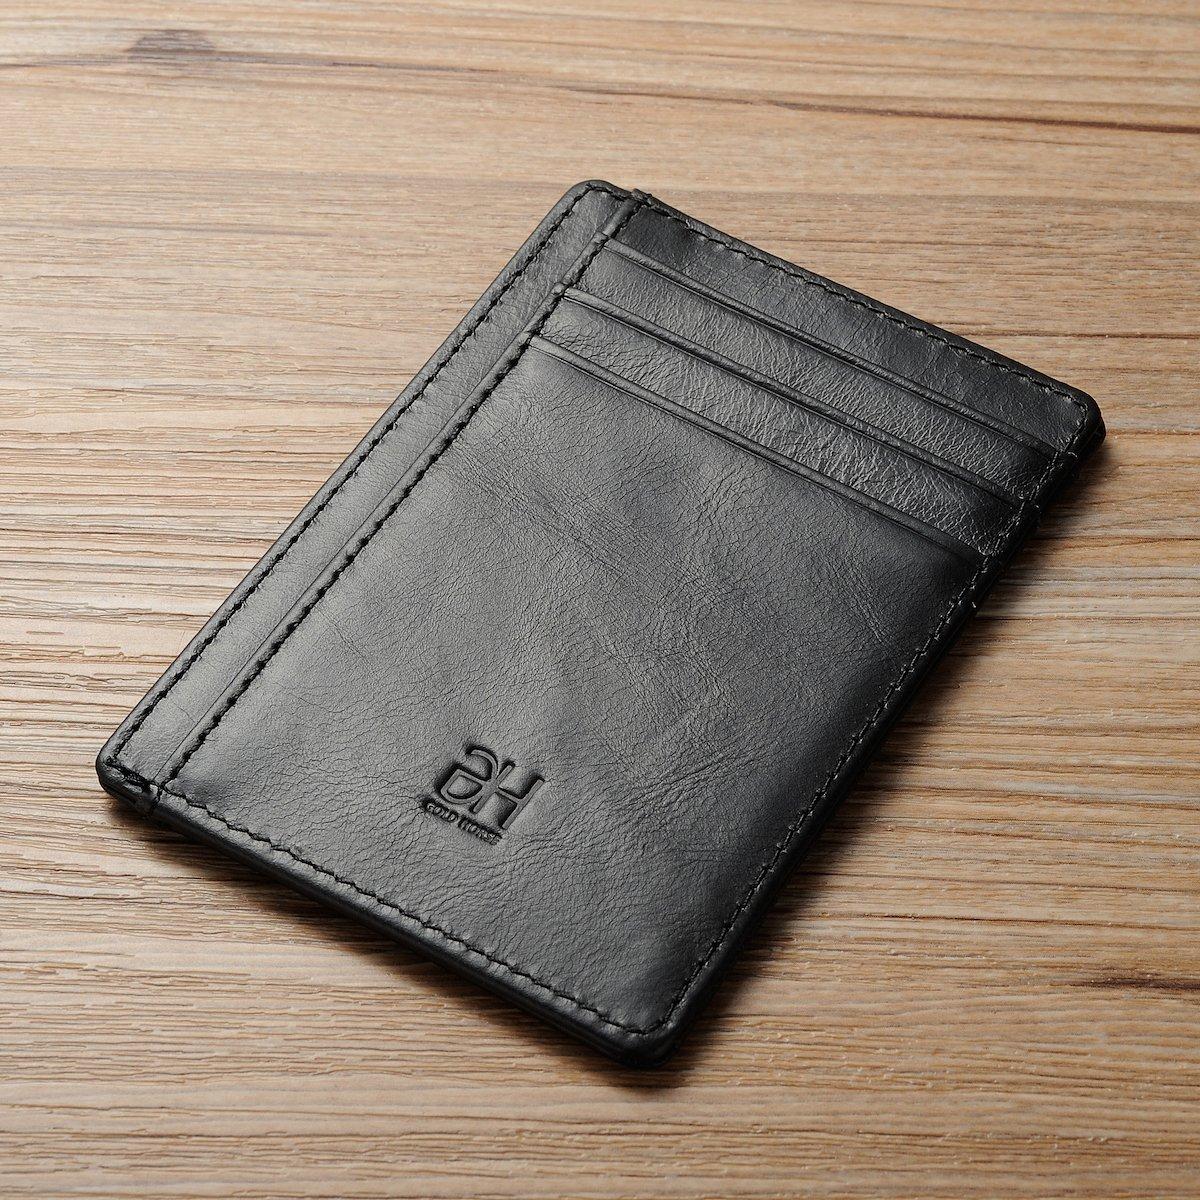 GH GOLD HORSE Slim RFID Blocking Card Holder Minimalist Leather Front Pocket Wallet for Women (Black) by GH GOLD HORSE (Image #7)